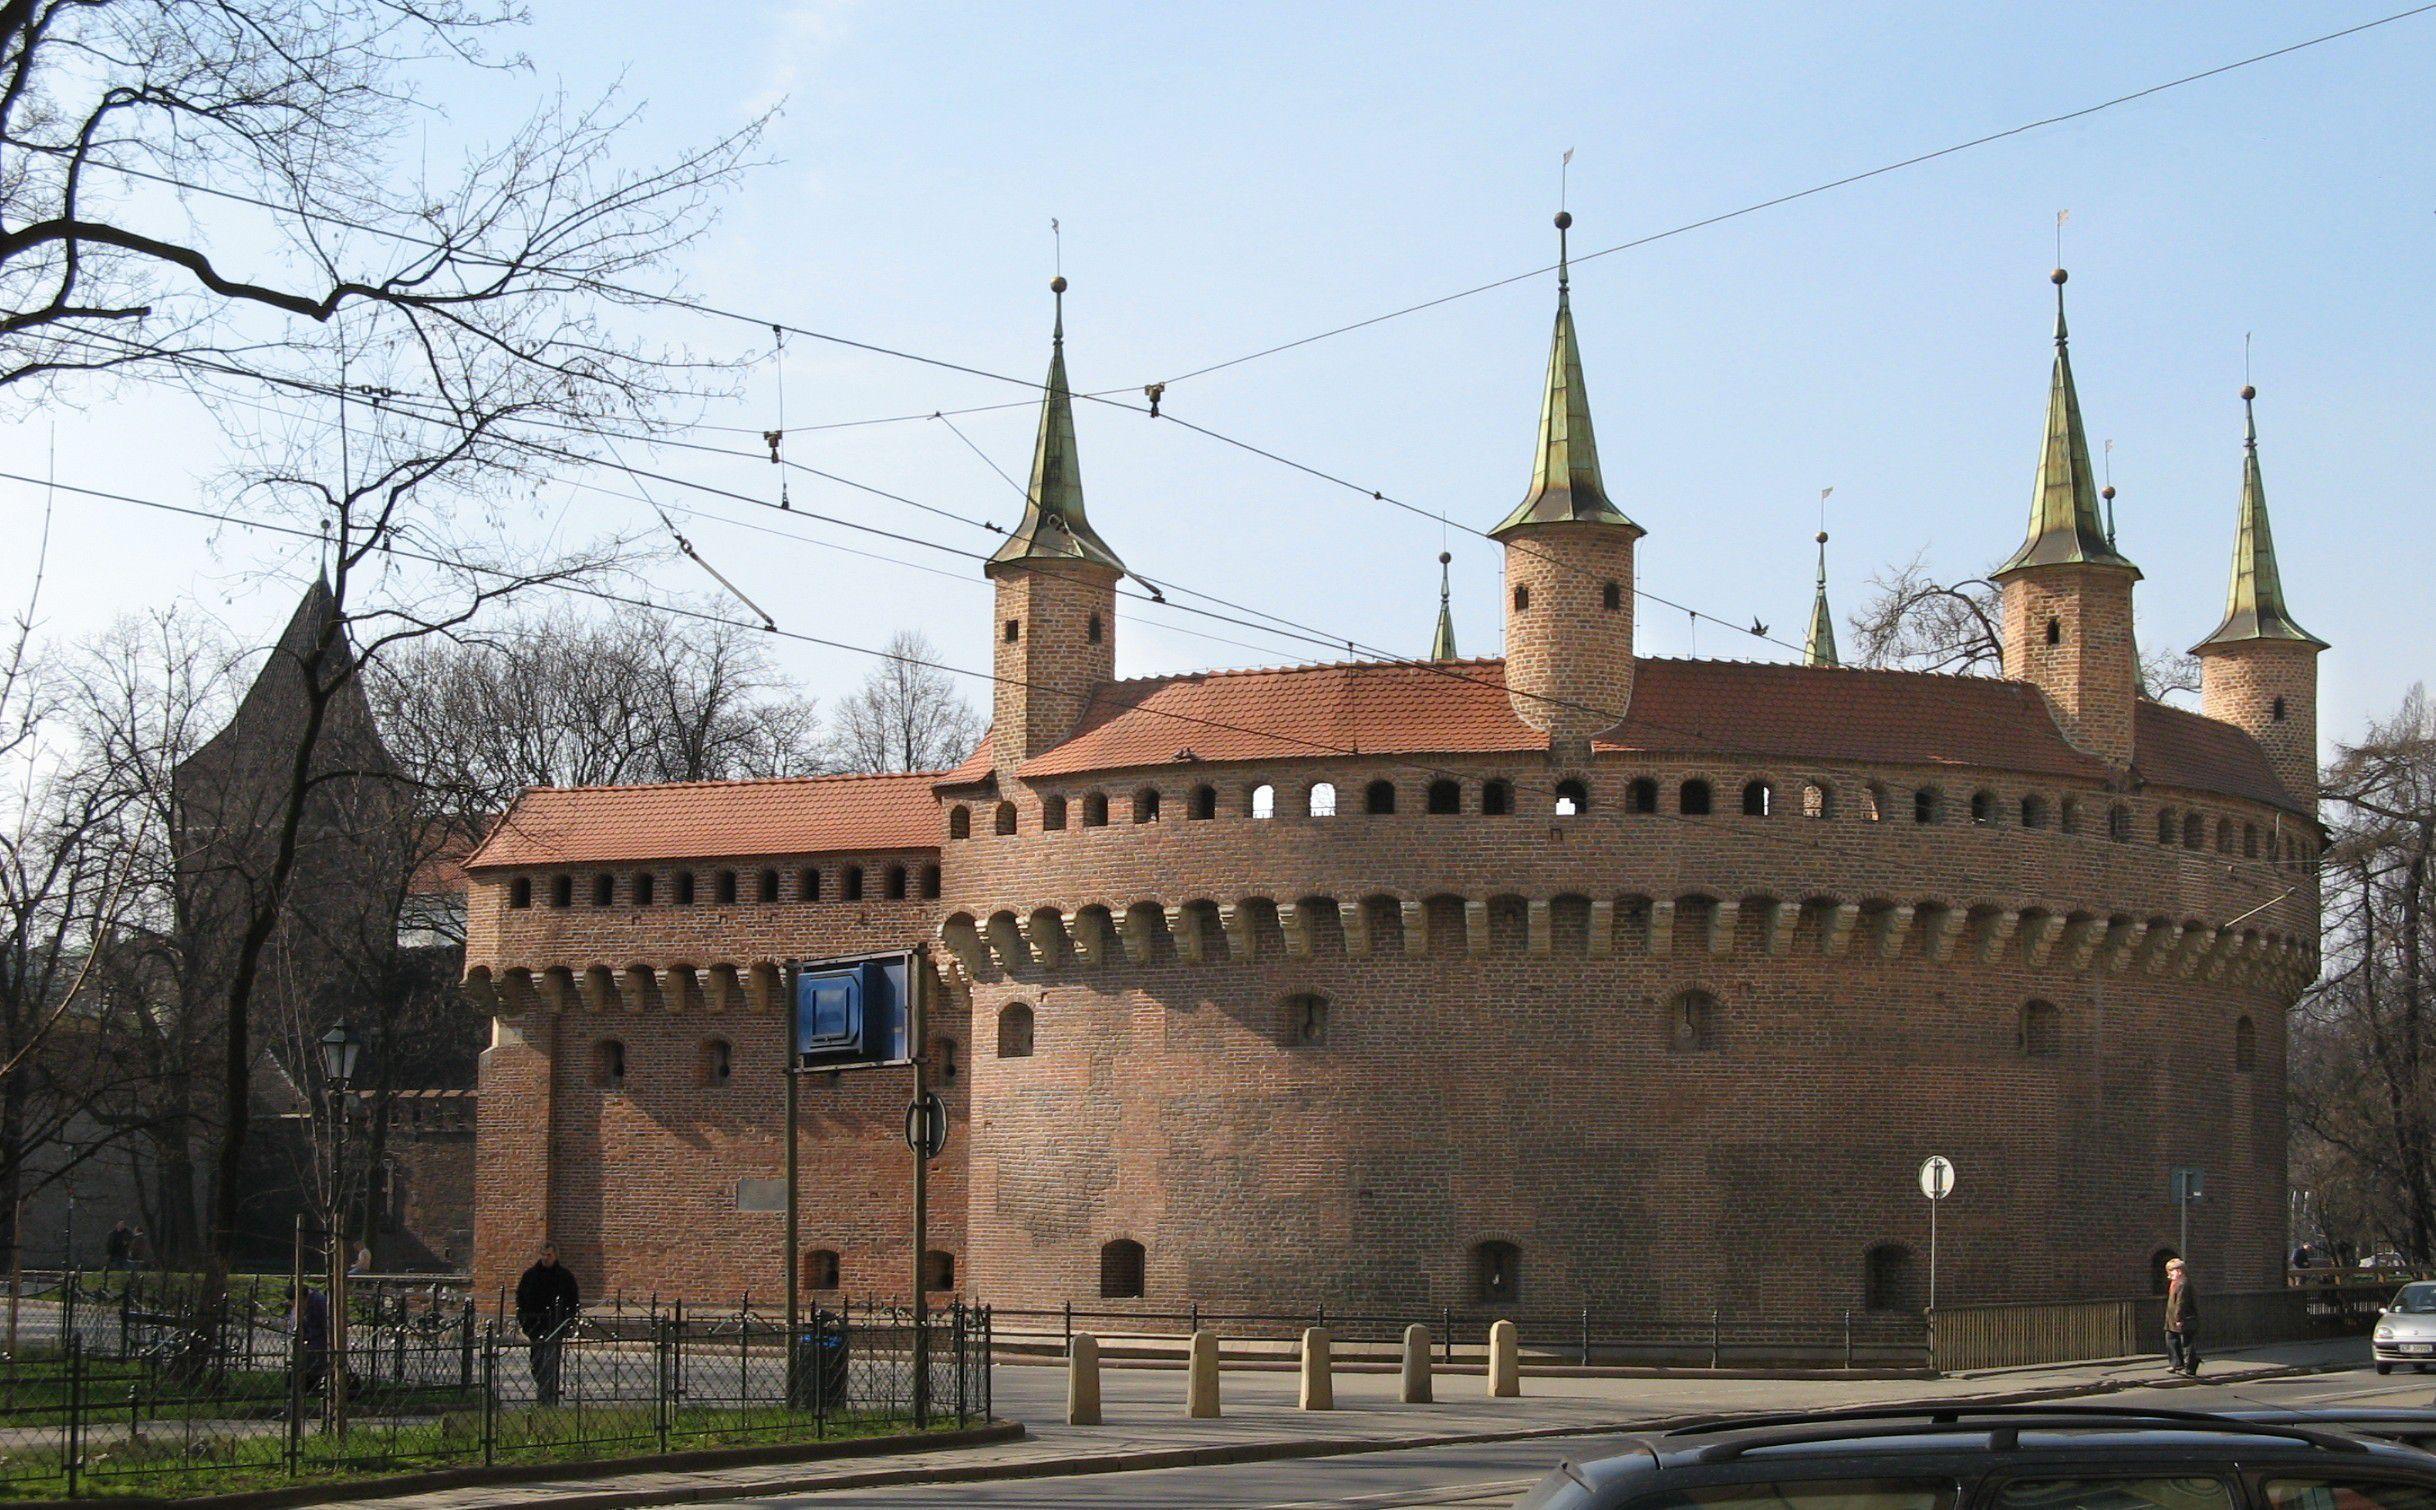 Krakow Images